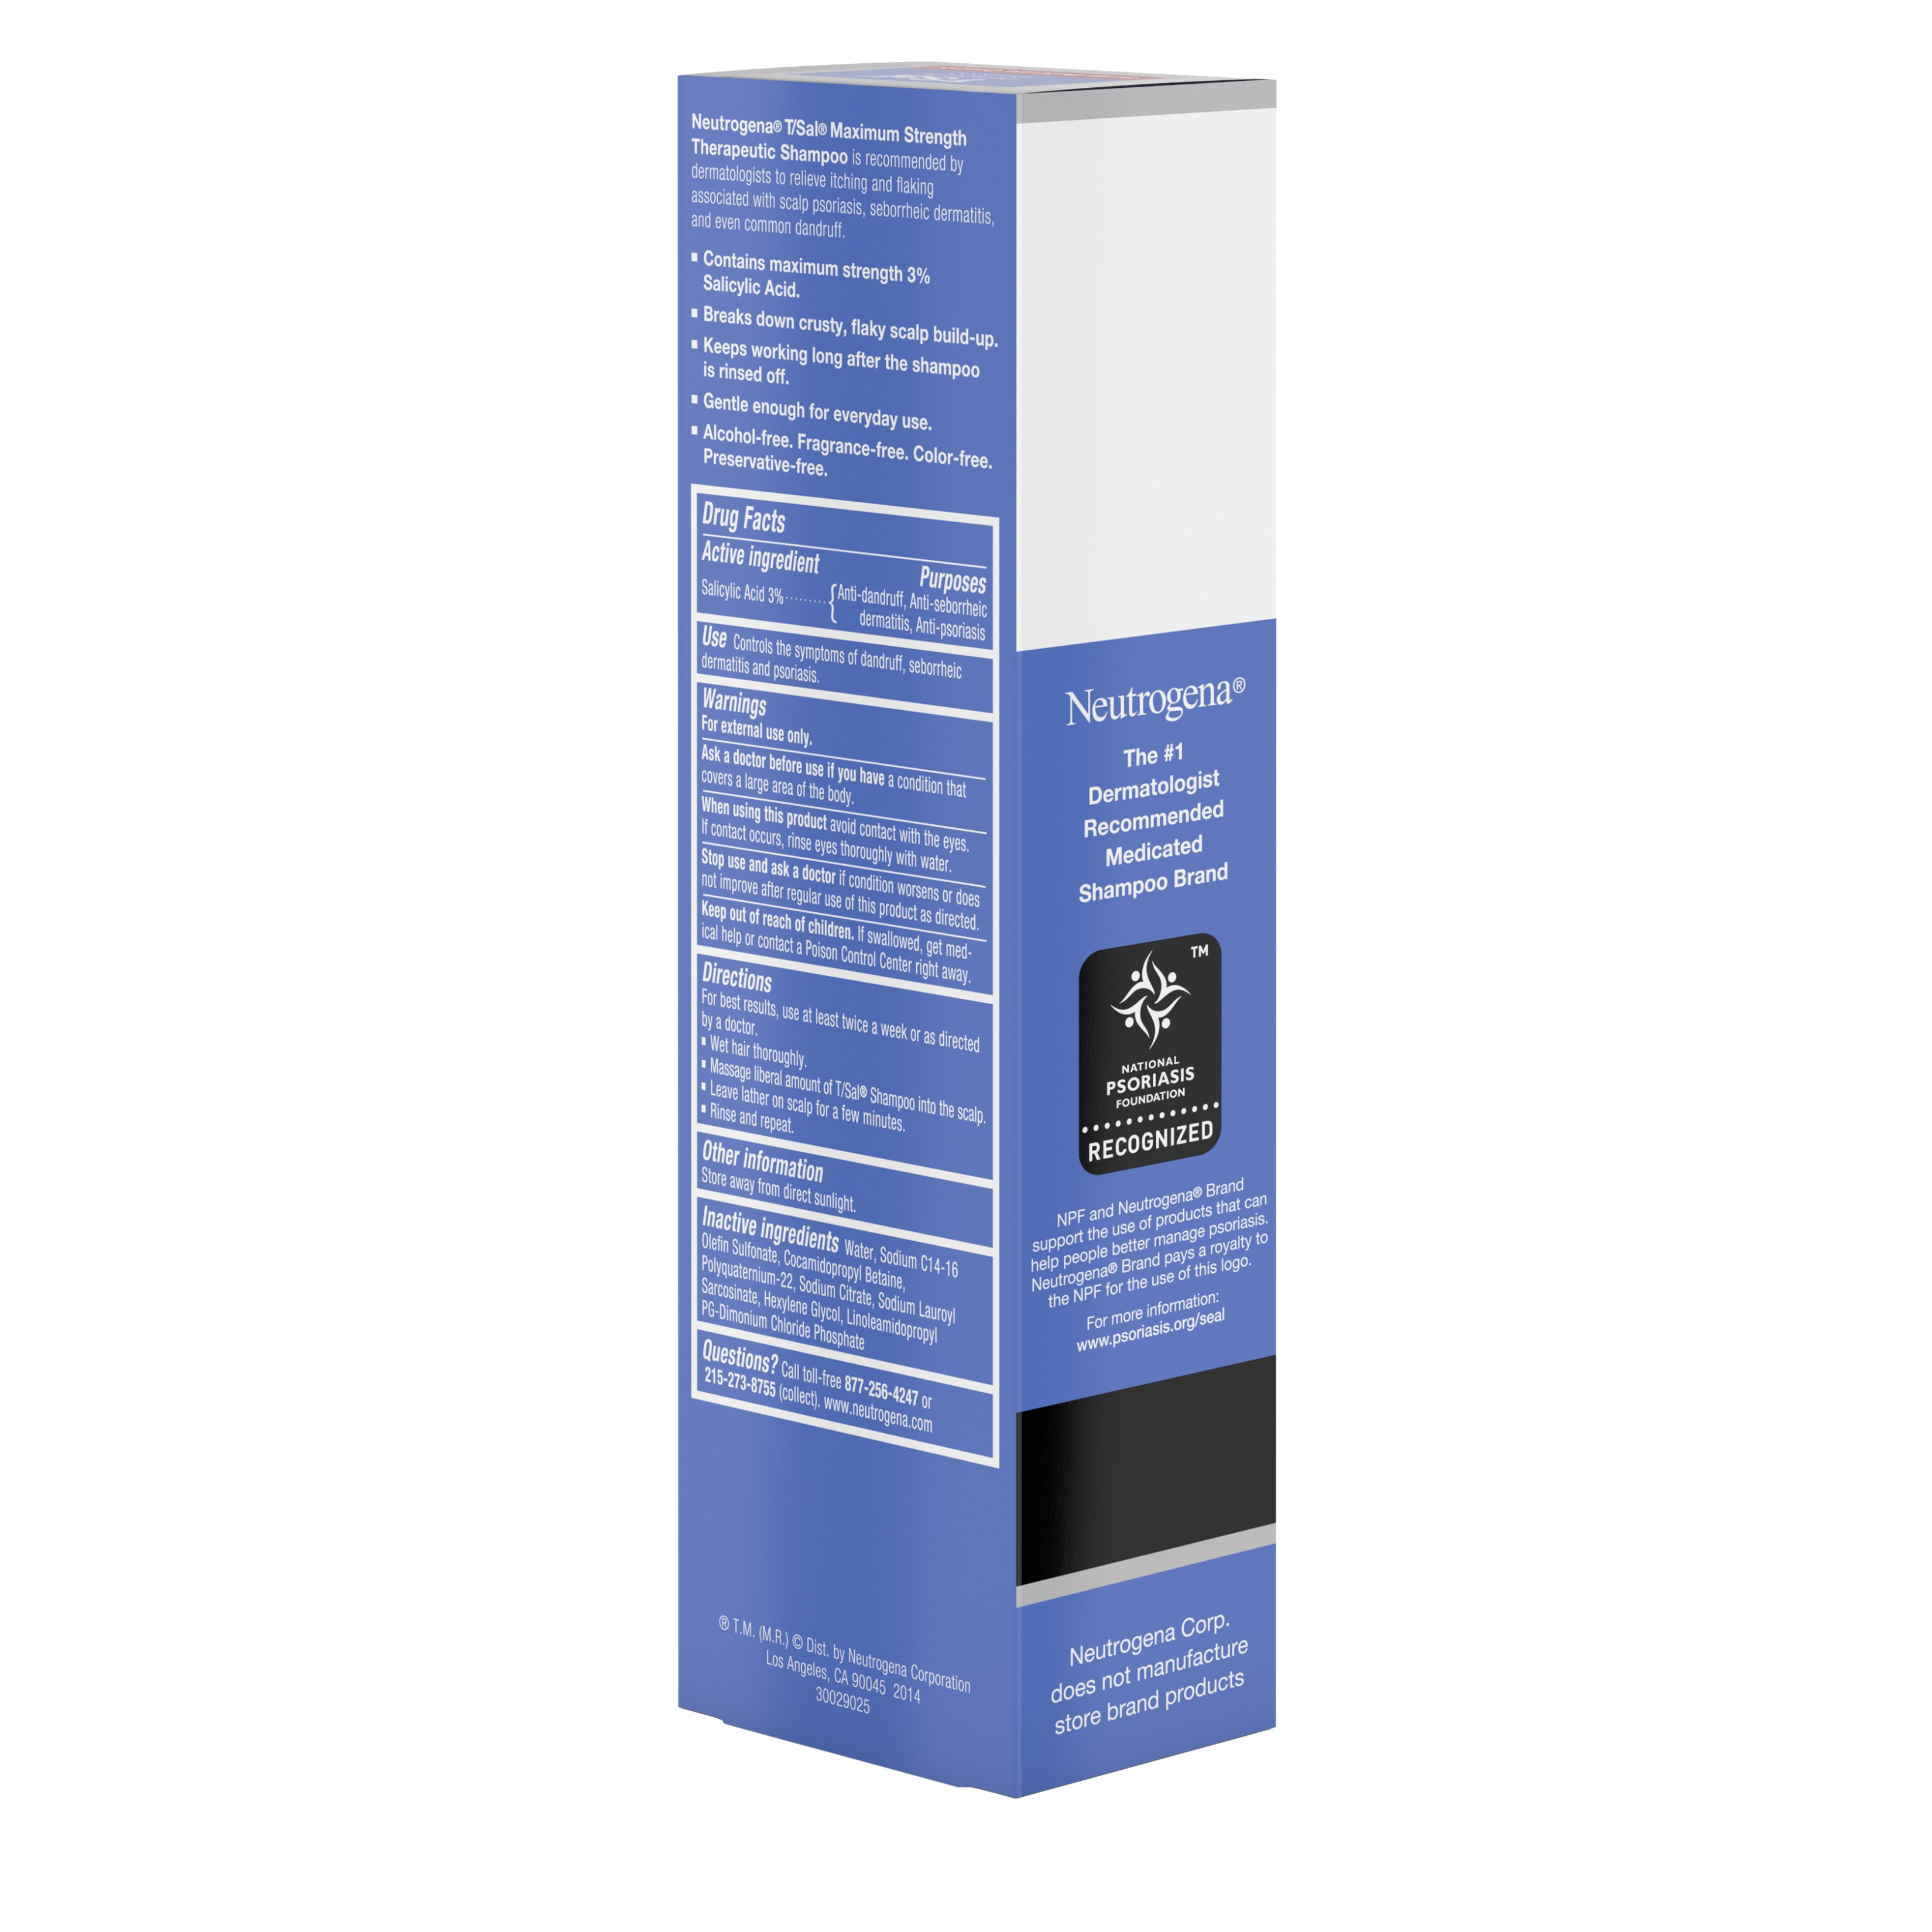 Neutrogena T Sal Therapeutic Shampoo With Scalp Build Up Control 3 Salicylic Acid 4 5 Fl Oz Walmart Com Walmart Com